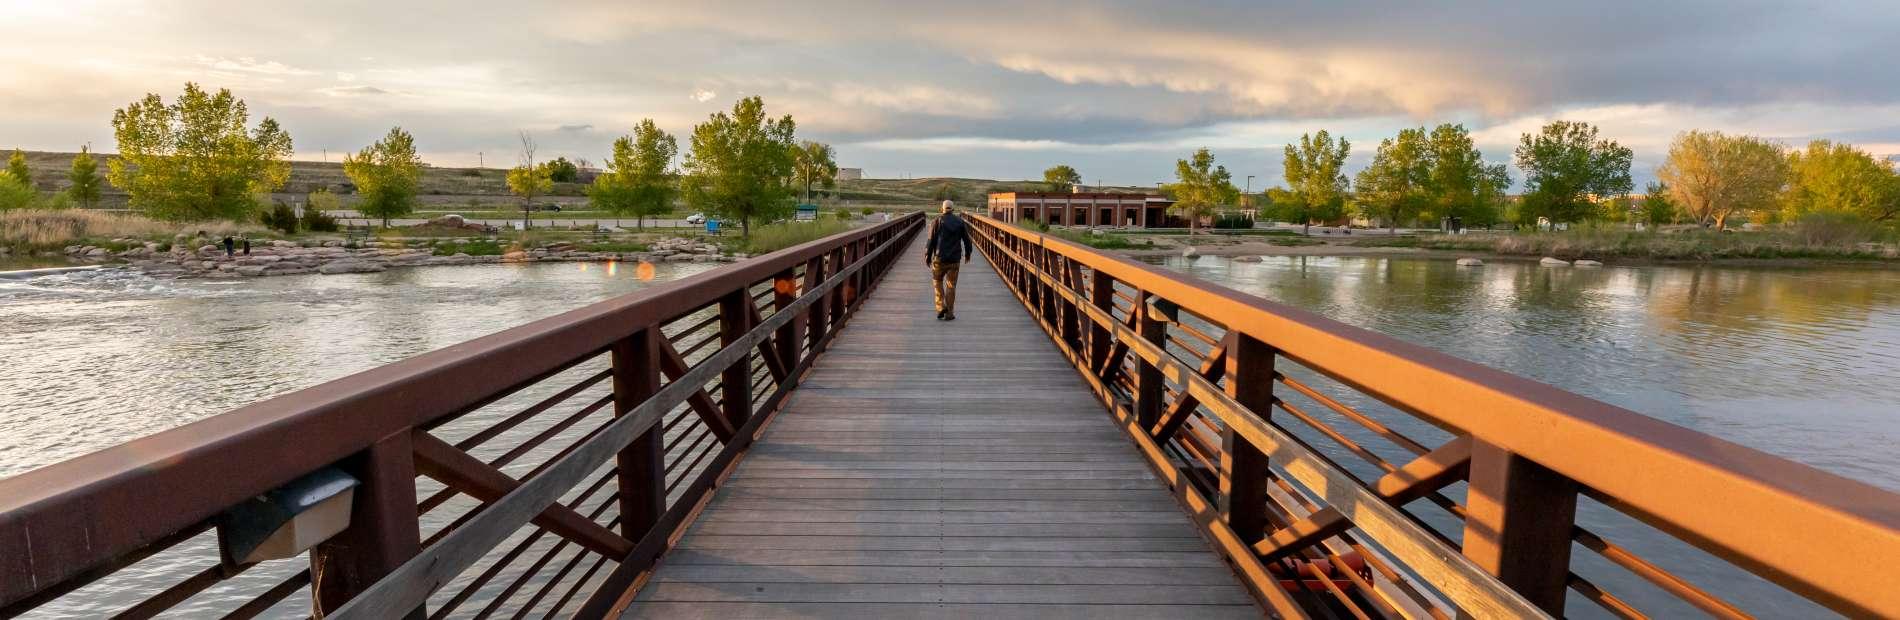 Platte River Trails   Casper, Wyoming   VisitCasper